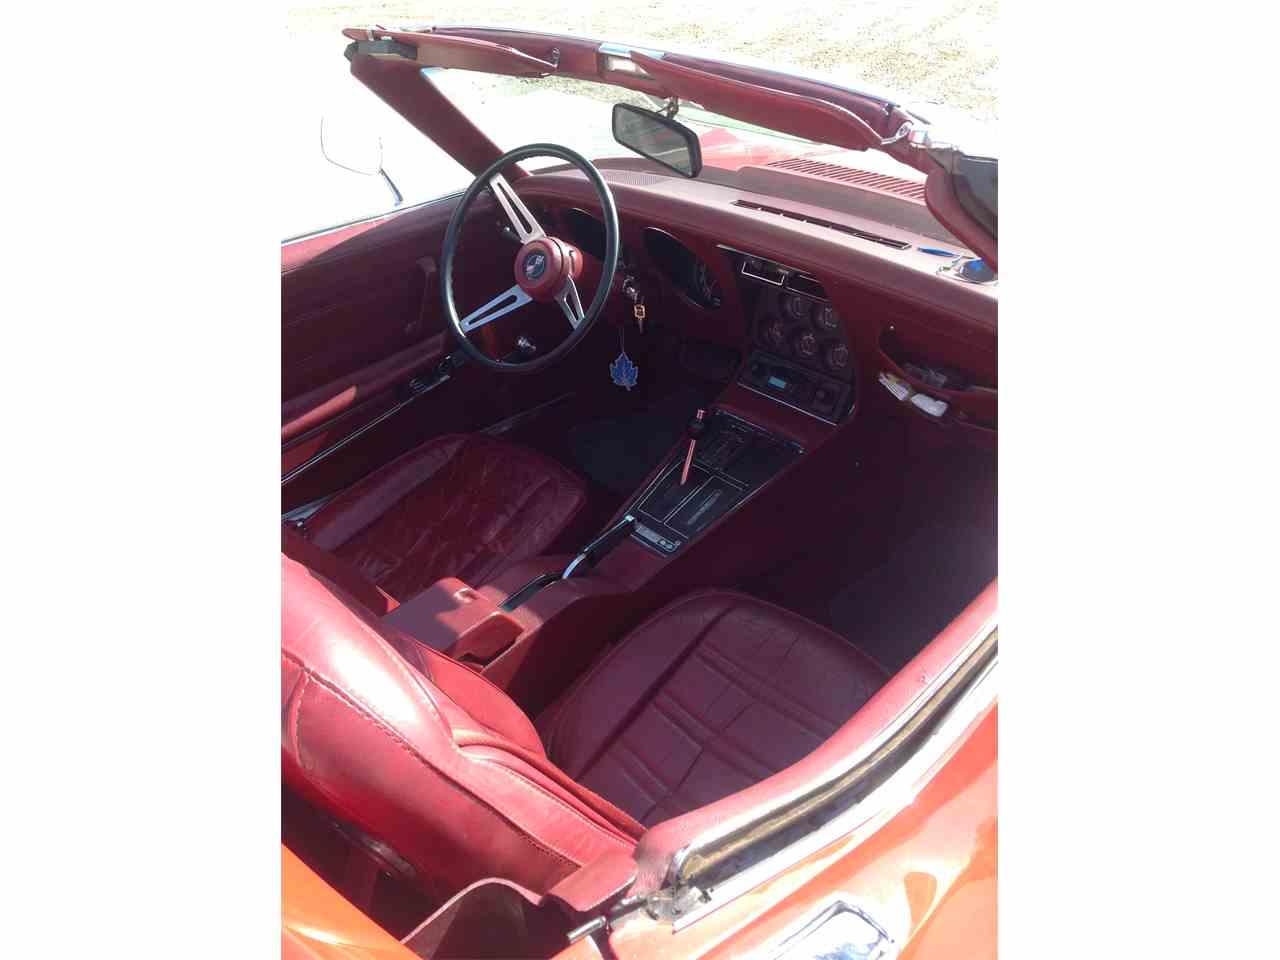 Large Picture of Classic '73 Corvette - $24,000.00 - HP0D